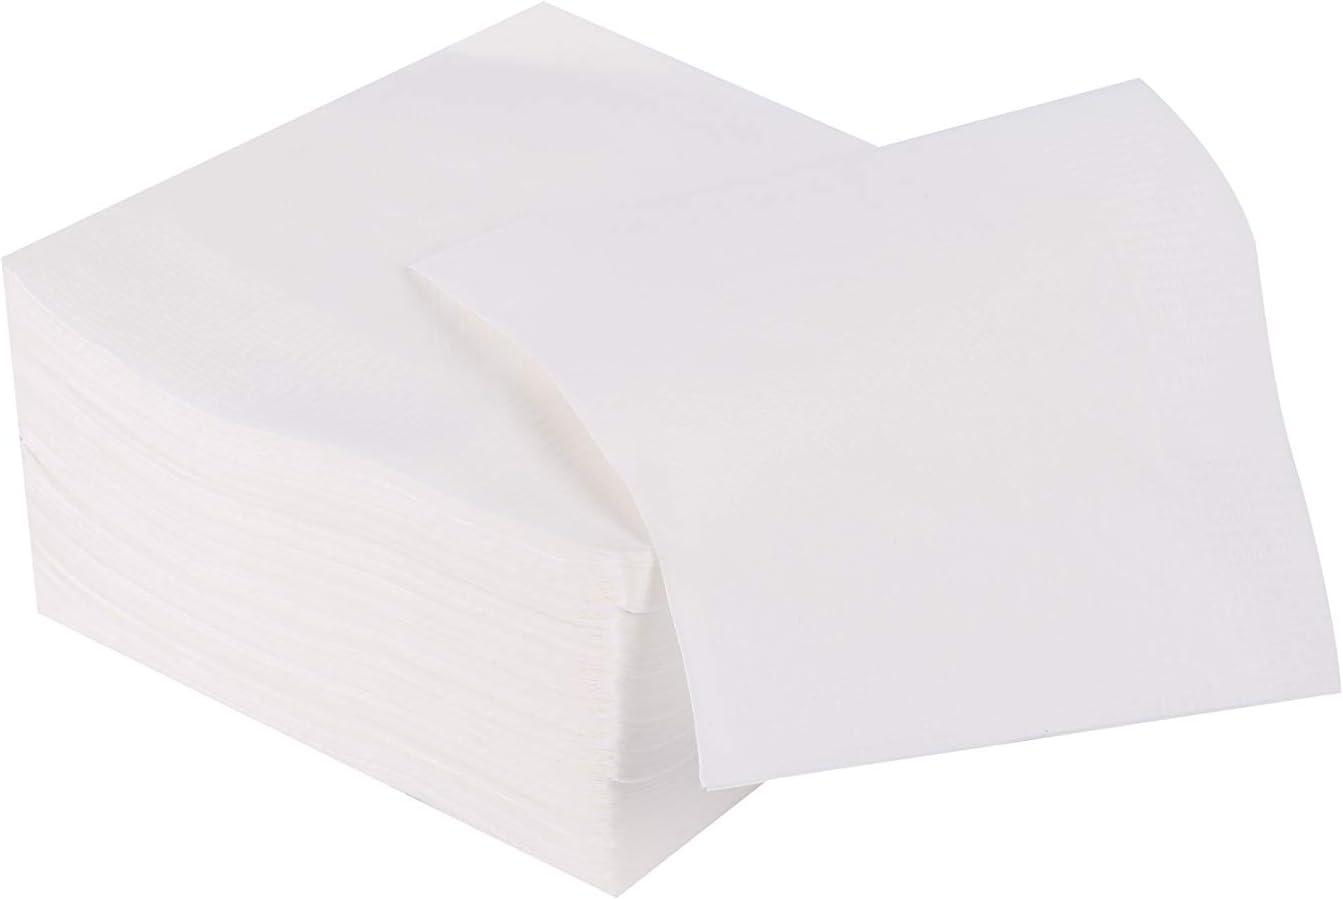 Gmark White Paper Beverage Napkins - 1000 Counts, 2 Packs of 500 Counts - Bar Events Home Function Restaurant Paper Napkins GM1118B